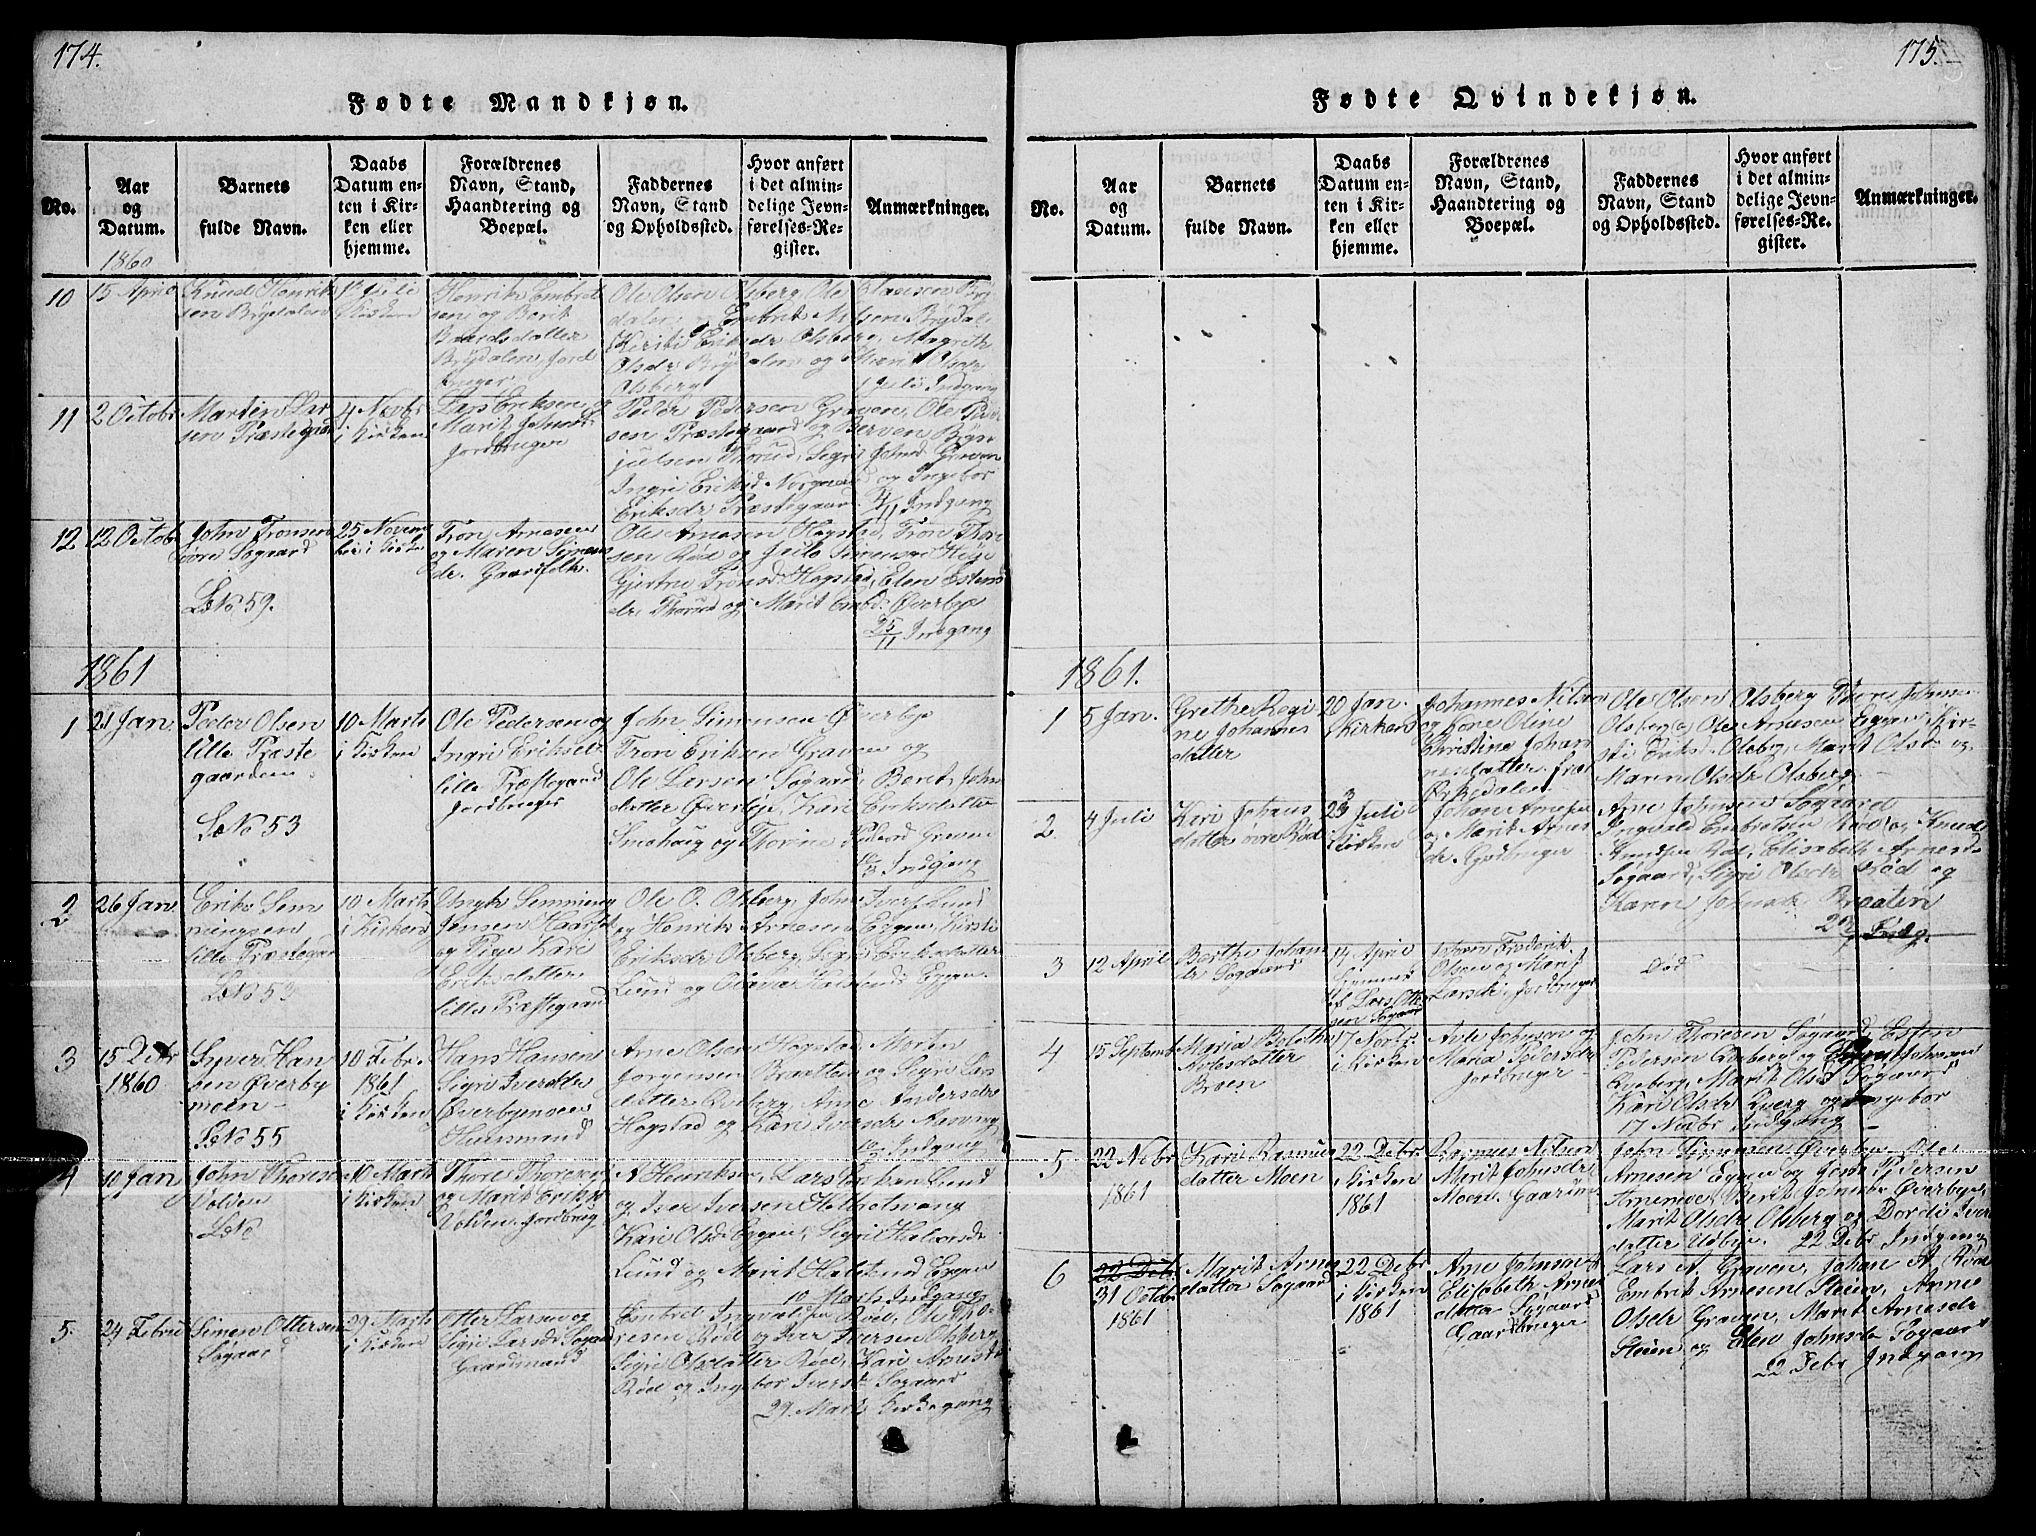 SAH, Tynset prestekontor, Klokkerbok nr. 4, 1814-1879, s. 174-175